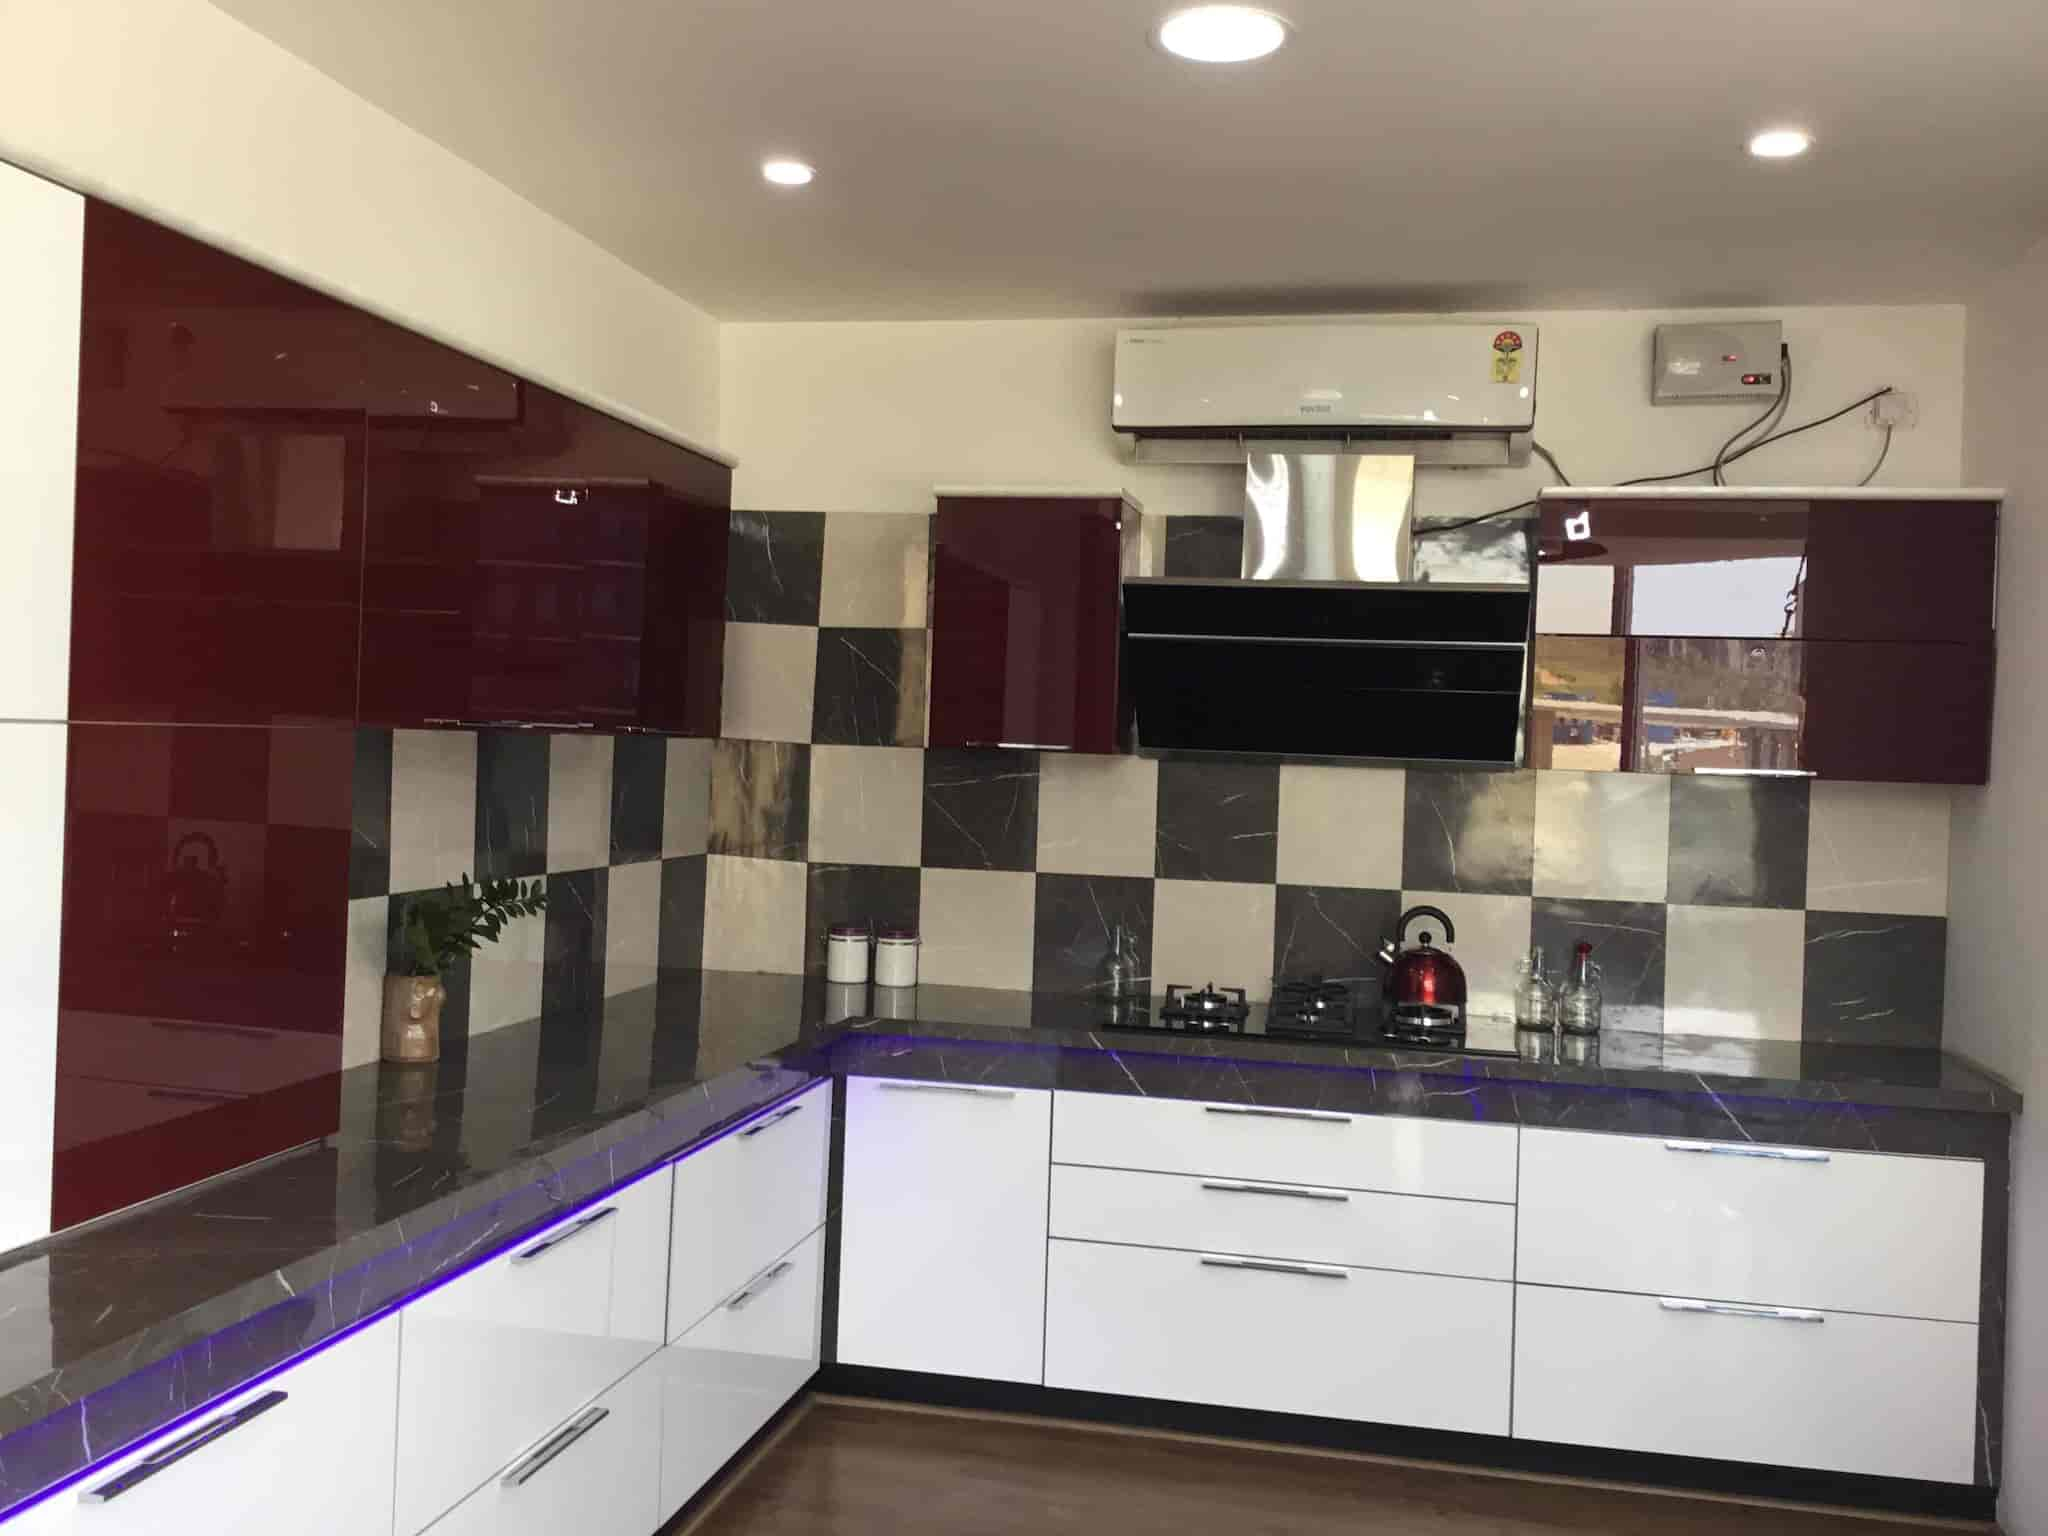 bella cucine kitchen interiors photos, bellandur, bangalore